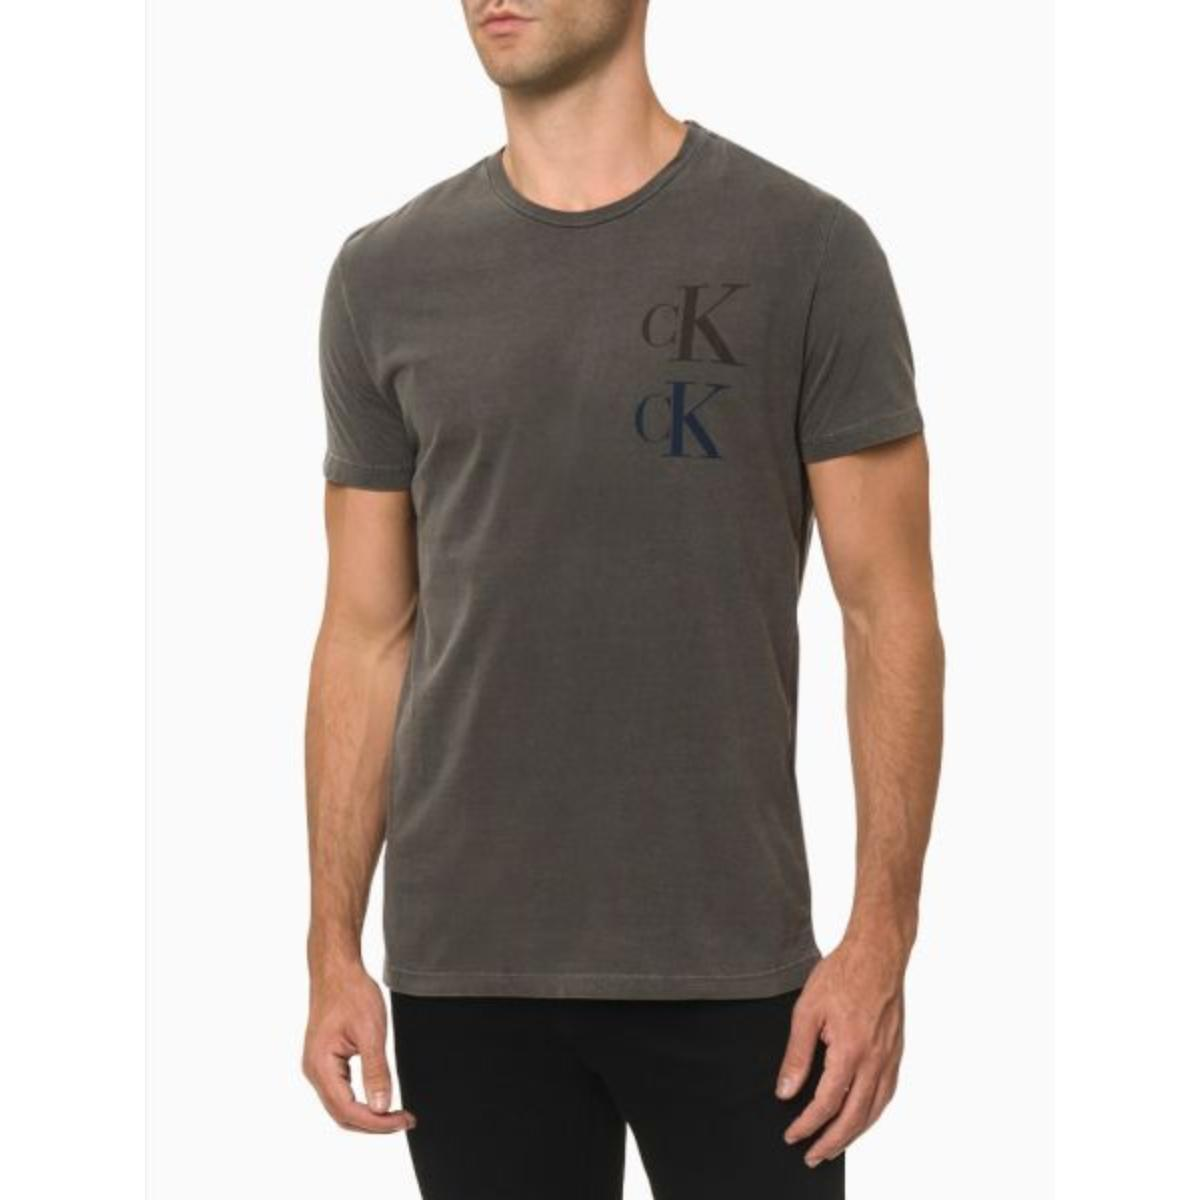 Camiseta Masculina Calvin Klein Cm1oc01i4068 Chumbo